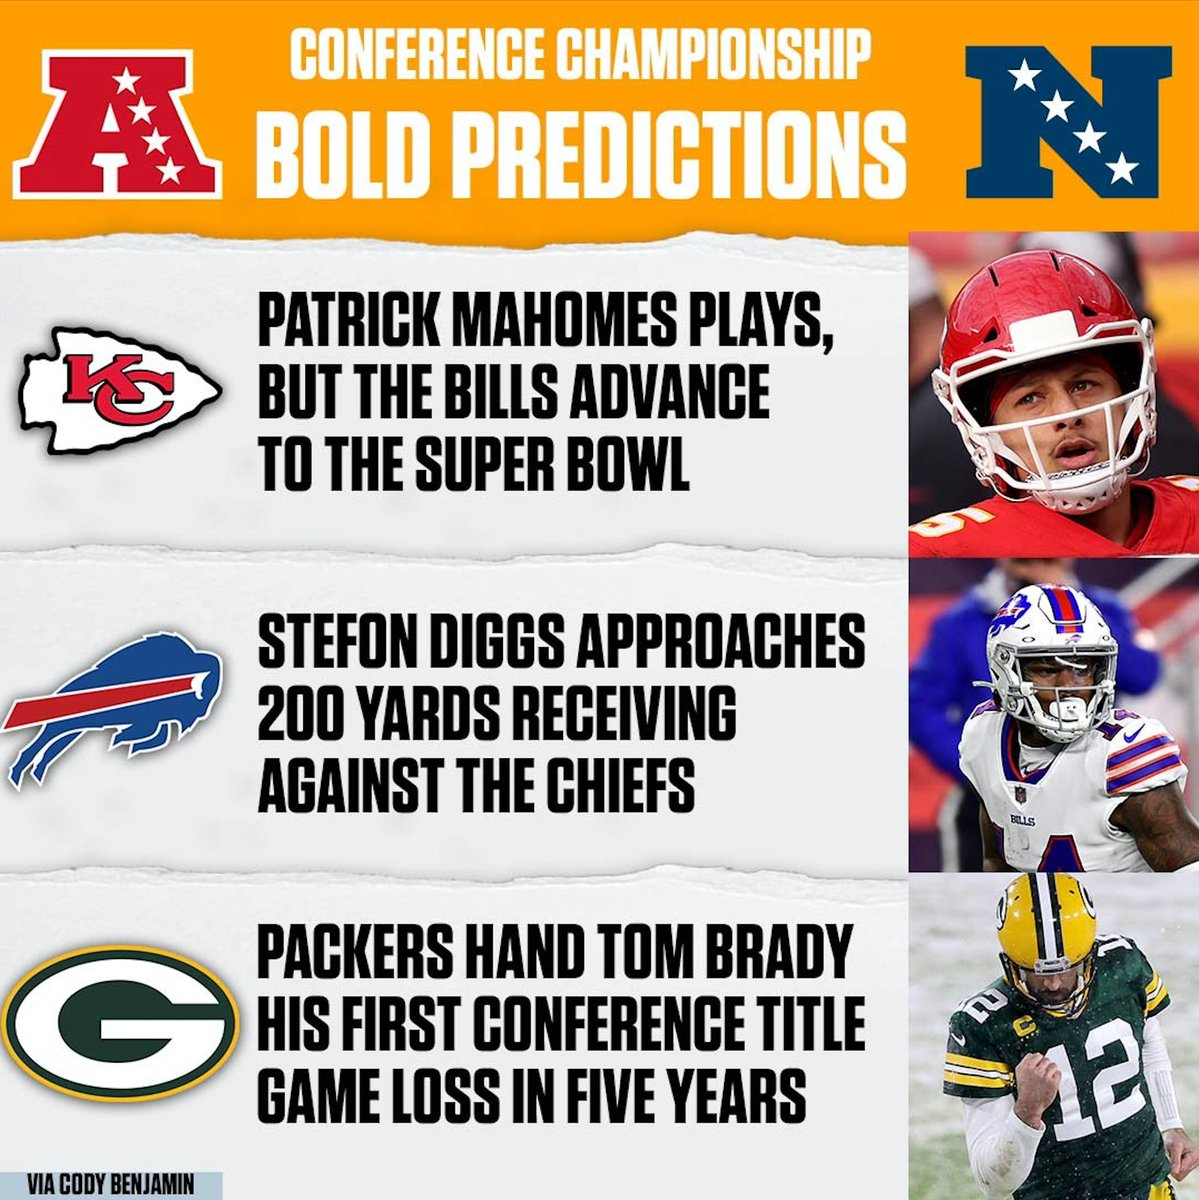 Championship Weekend Bold Predictions  Thoughts? 🤔  (via @CodyJBenjamin)